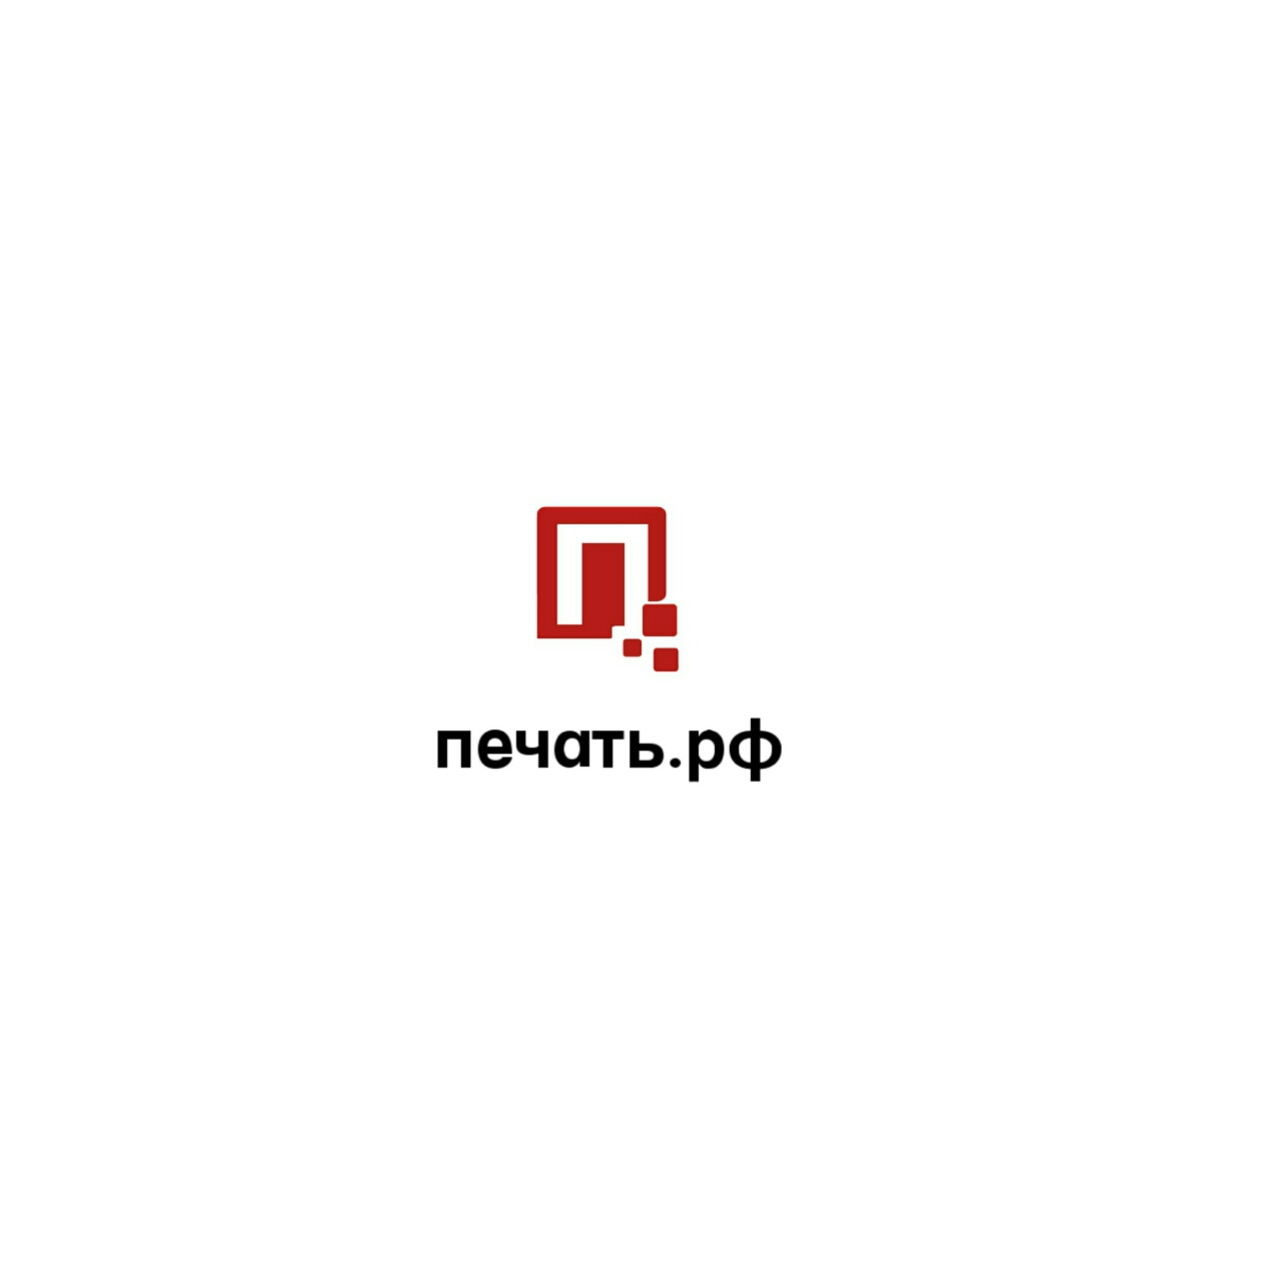 Логотип для веб-сервиса интерьерной печати и оперативной пол фото f_5375d28ce4a1bd61.jpg